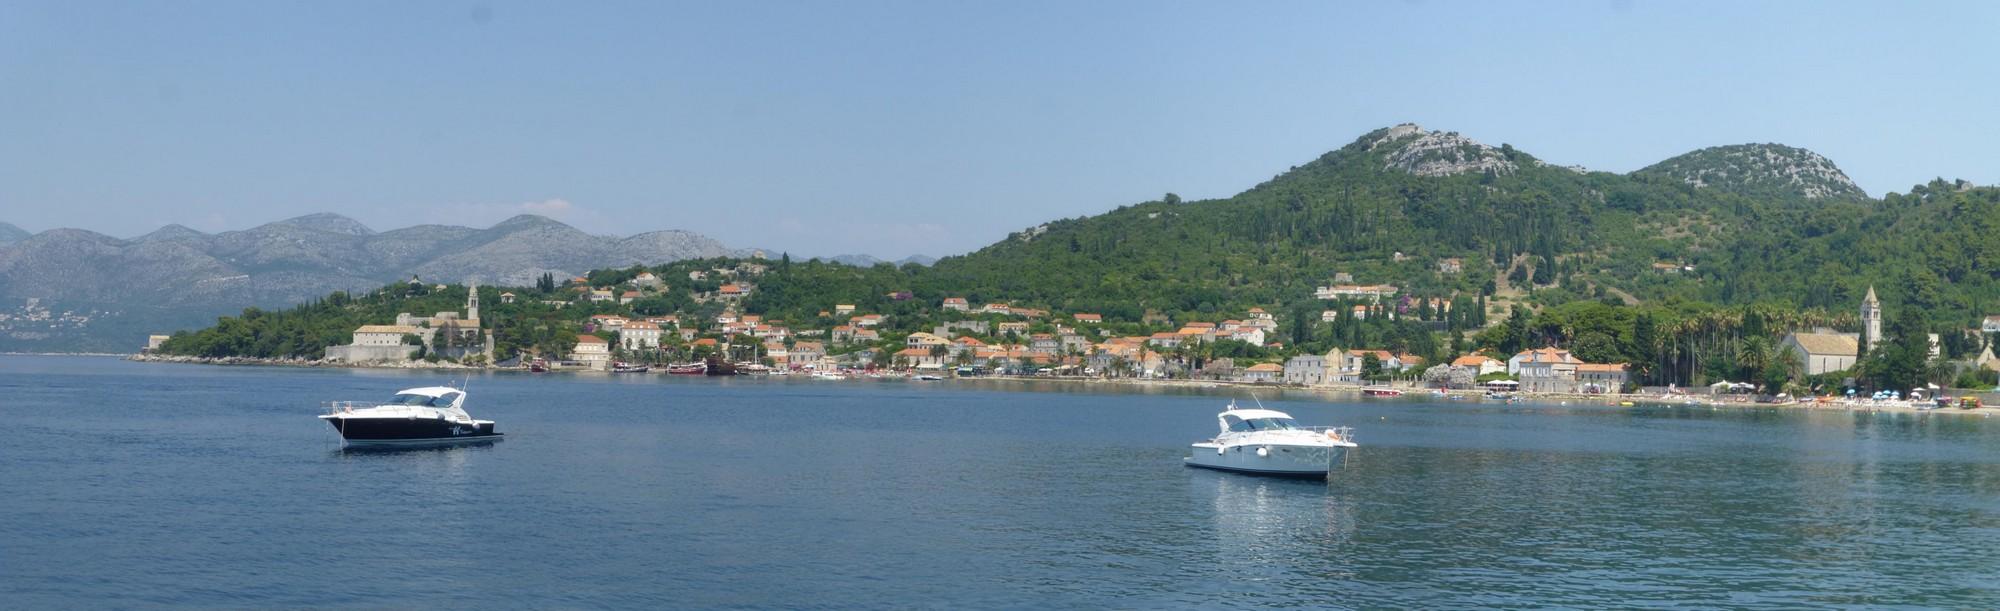 mlini-croatie